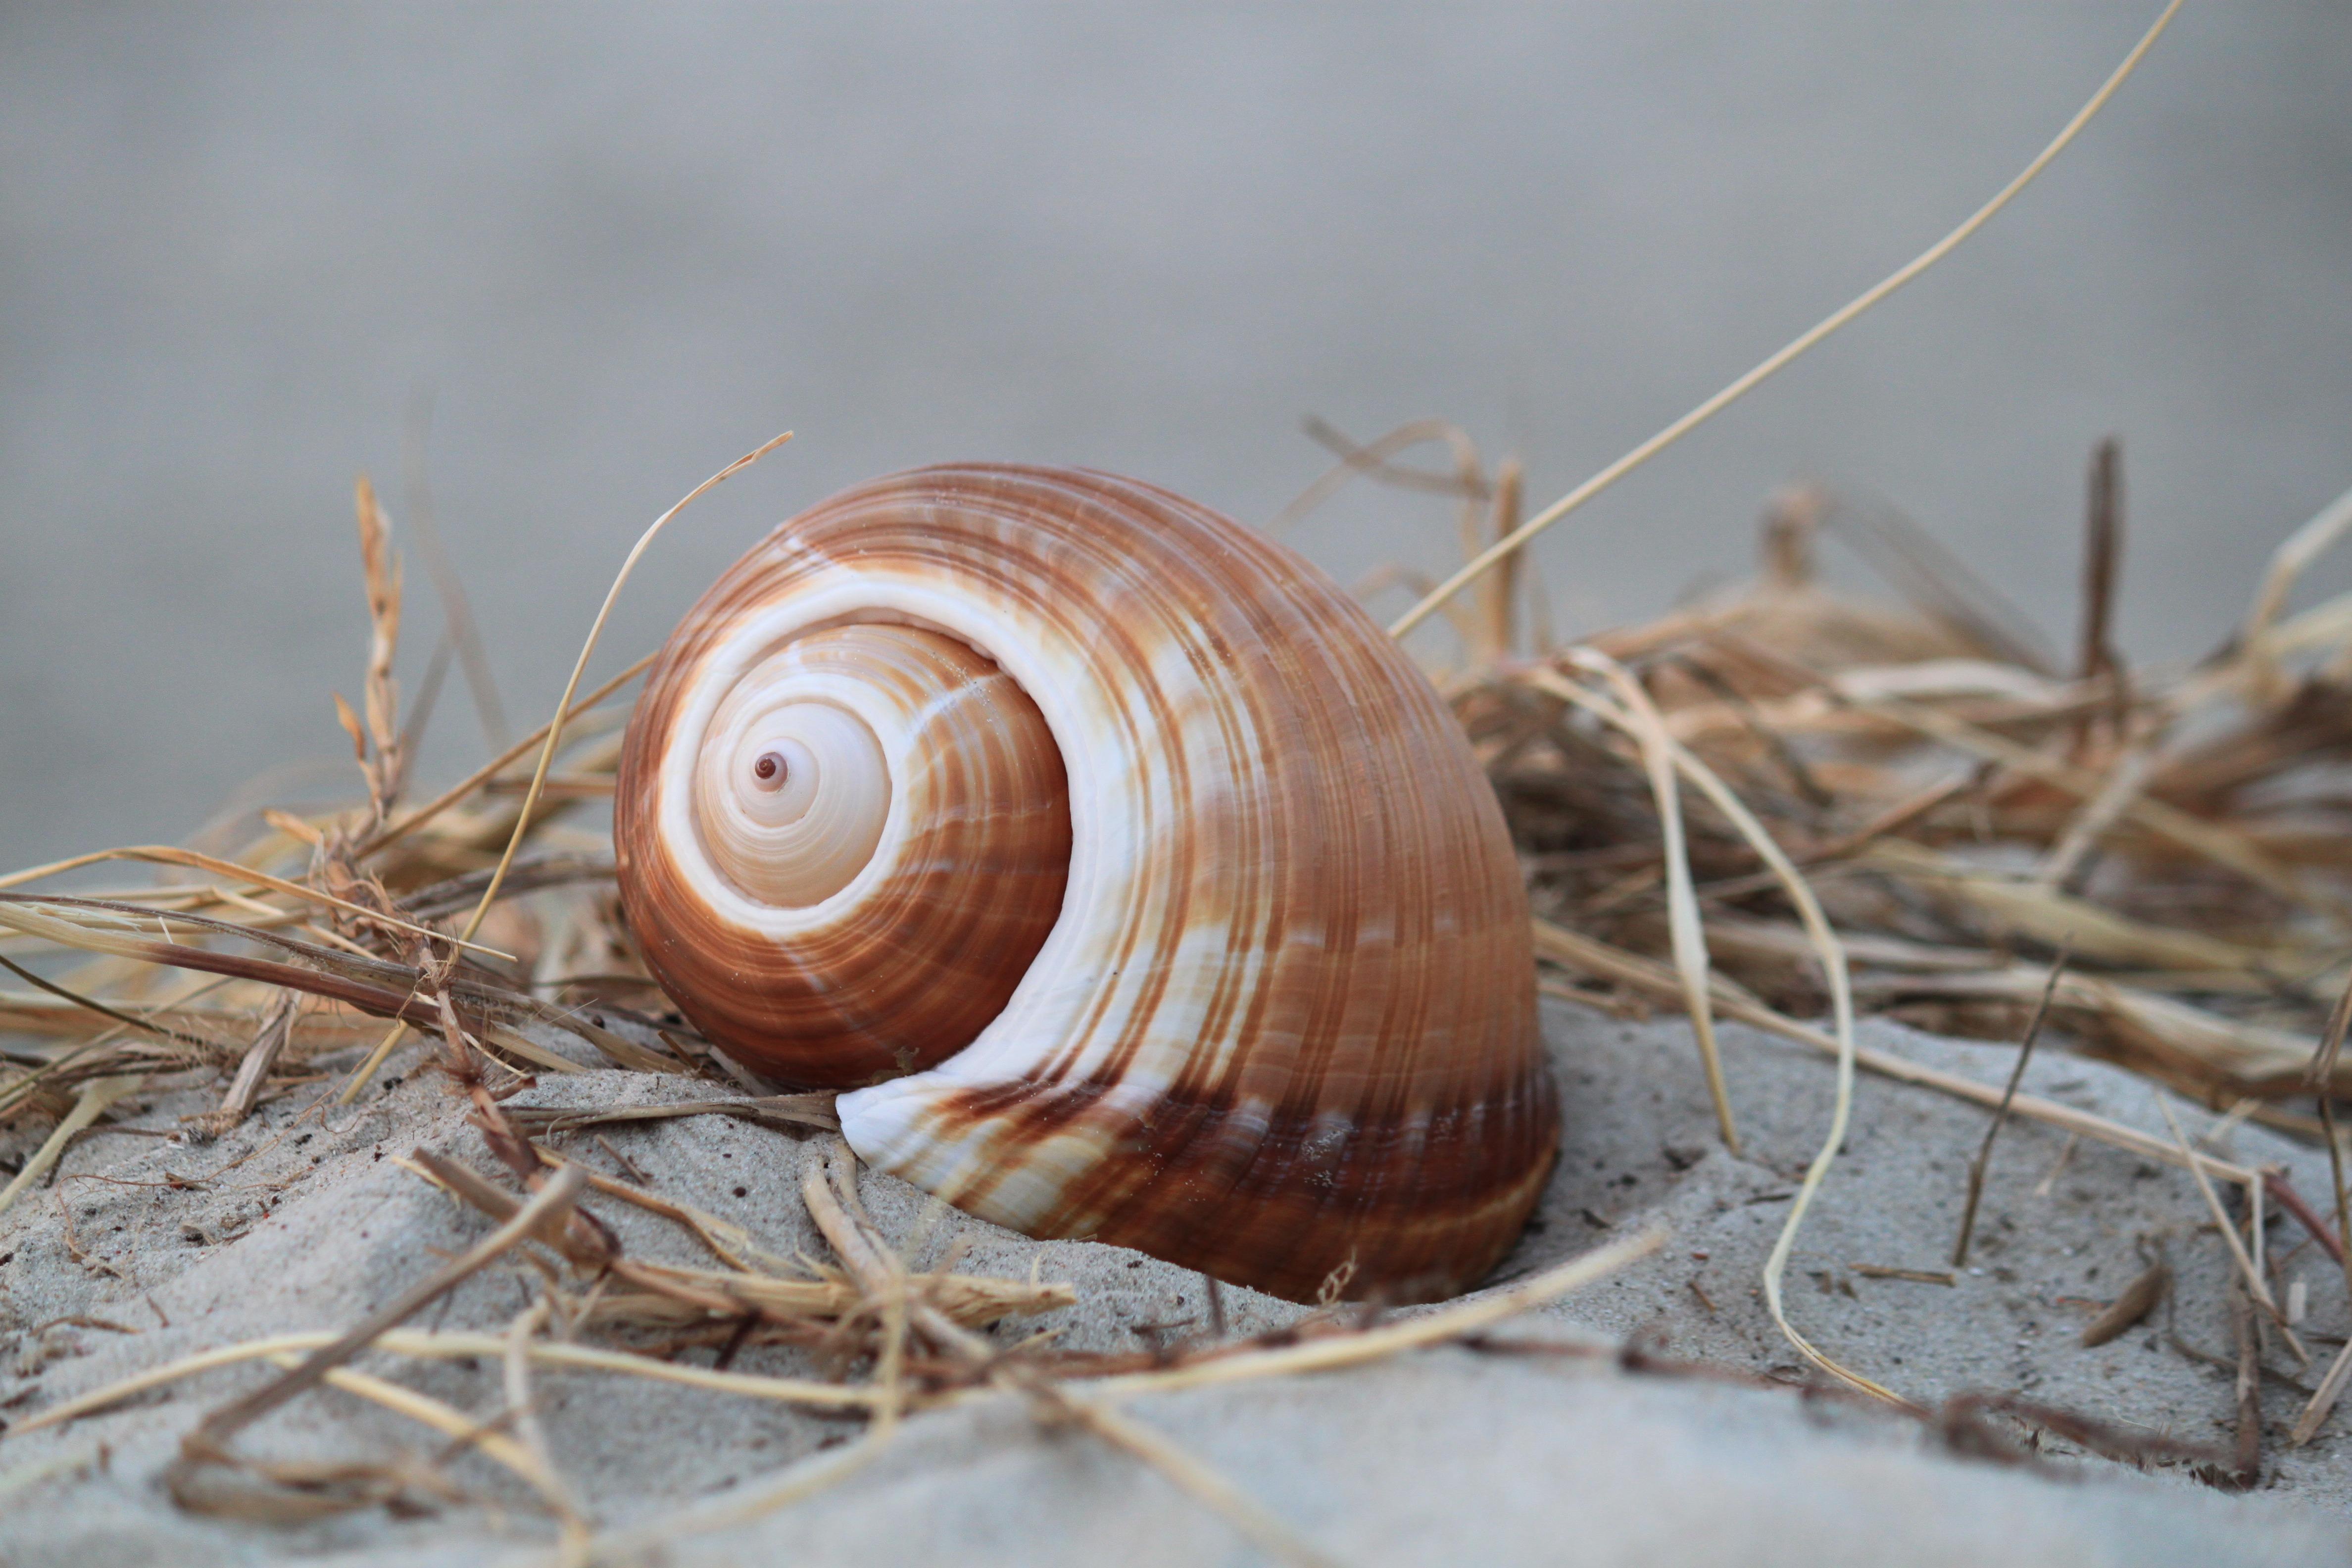 Fotos gratis : costa, naturaleza, espiral, viajar, patrón, fiesta ...